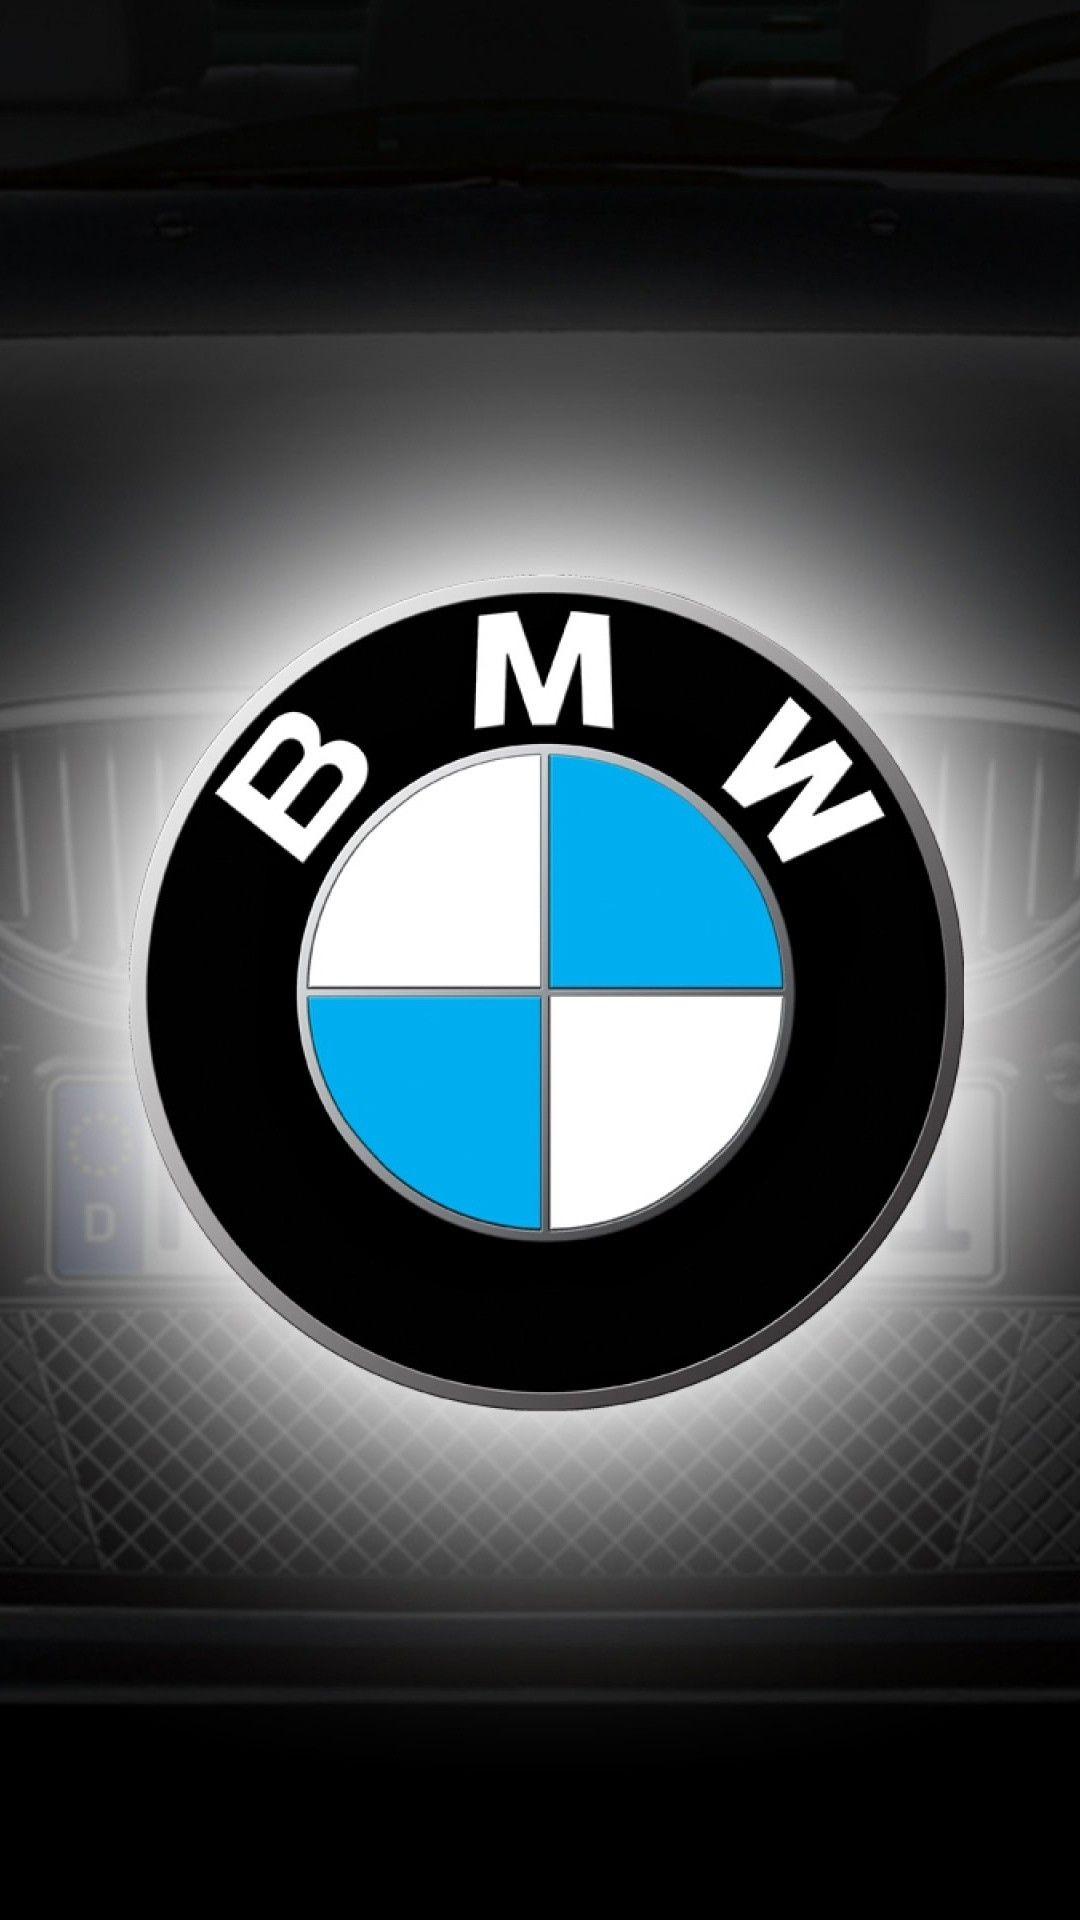 Bmw Logo Grey Blue Car Smartphone Wallpaper And Lockscreen Hd